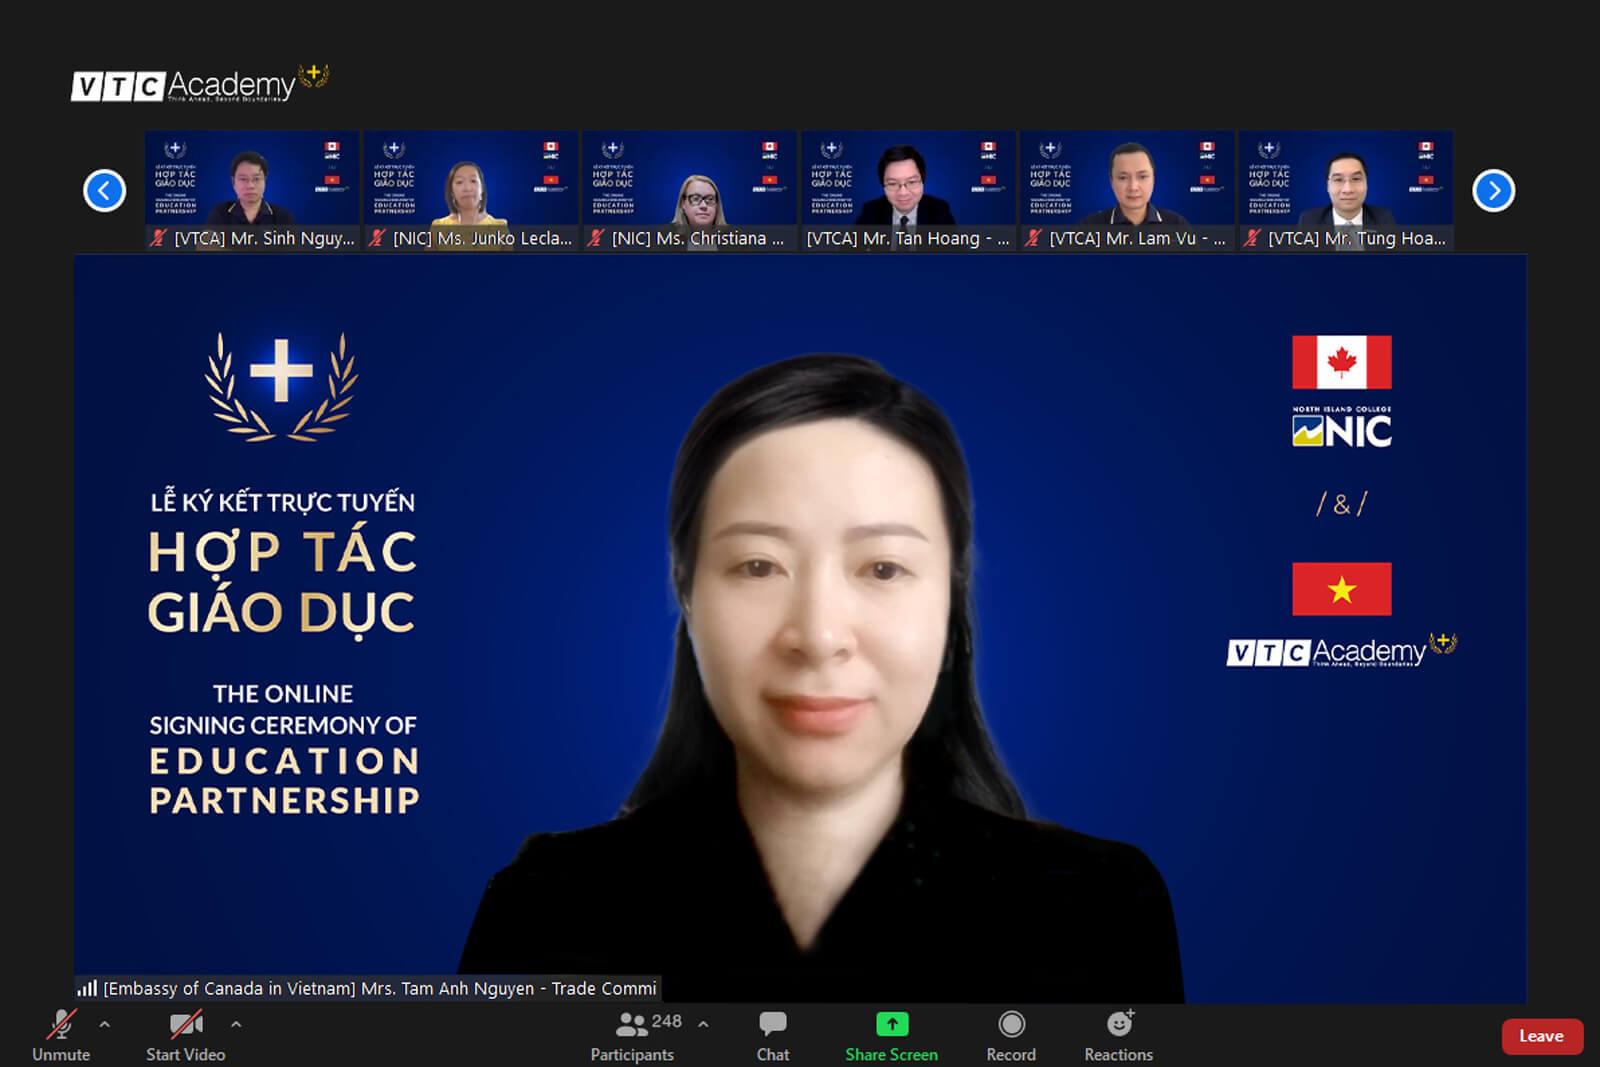 le-ky-ket-hop-tac-giao-duc-nic-vtc-academy-7